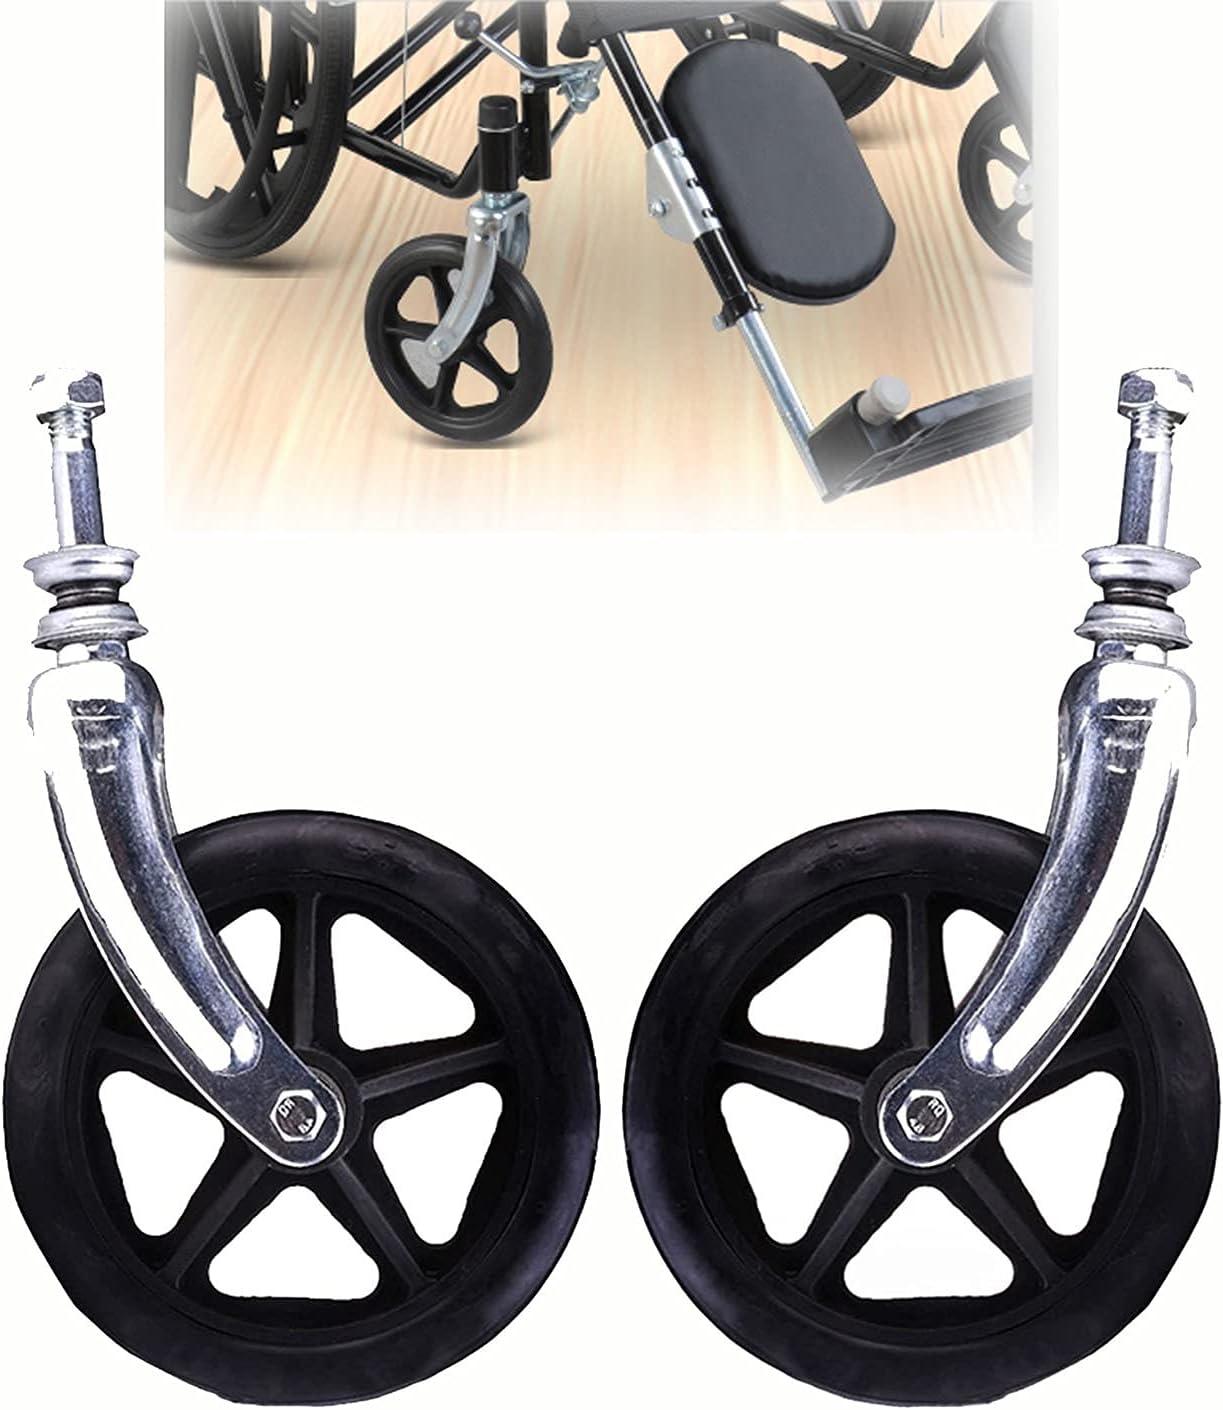 Long Beach Finally popular brand Mall ASDFGHJ Wheelchair Caster Accessories 6in Pair of Black Wh 15cm